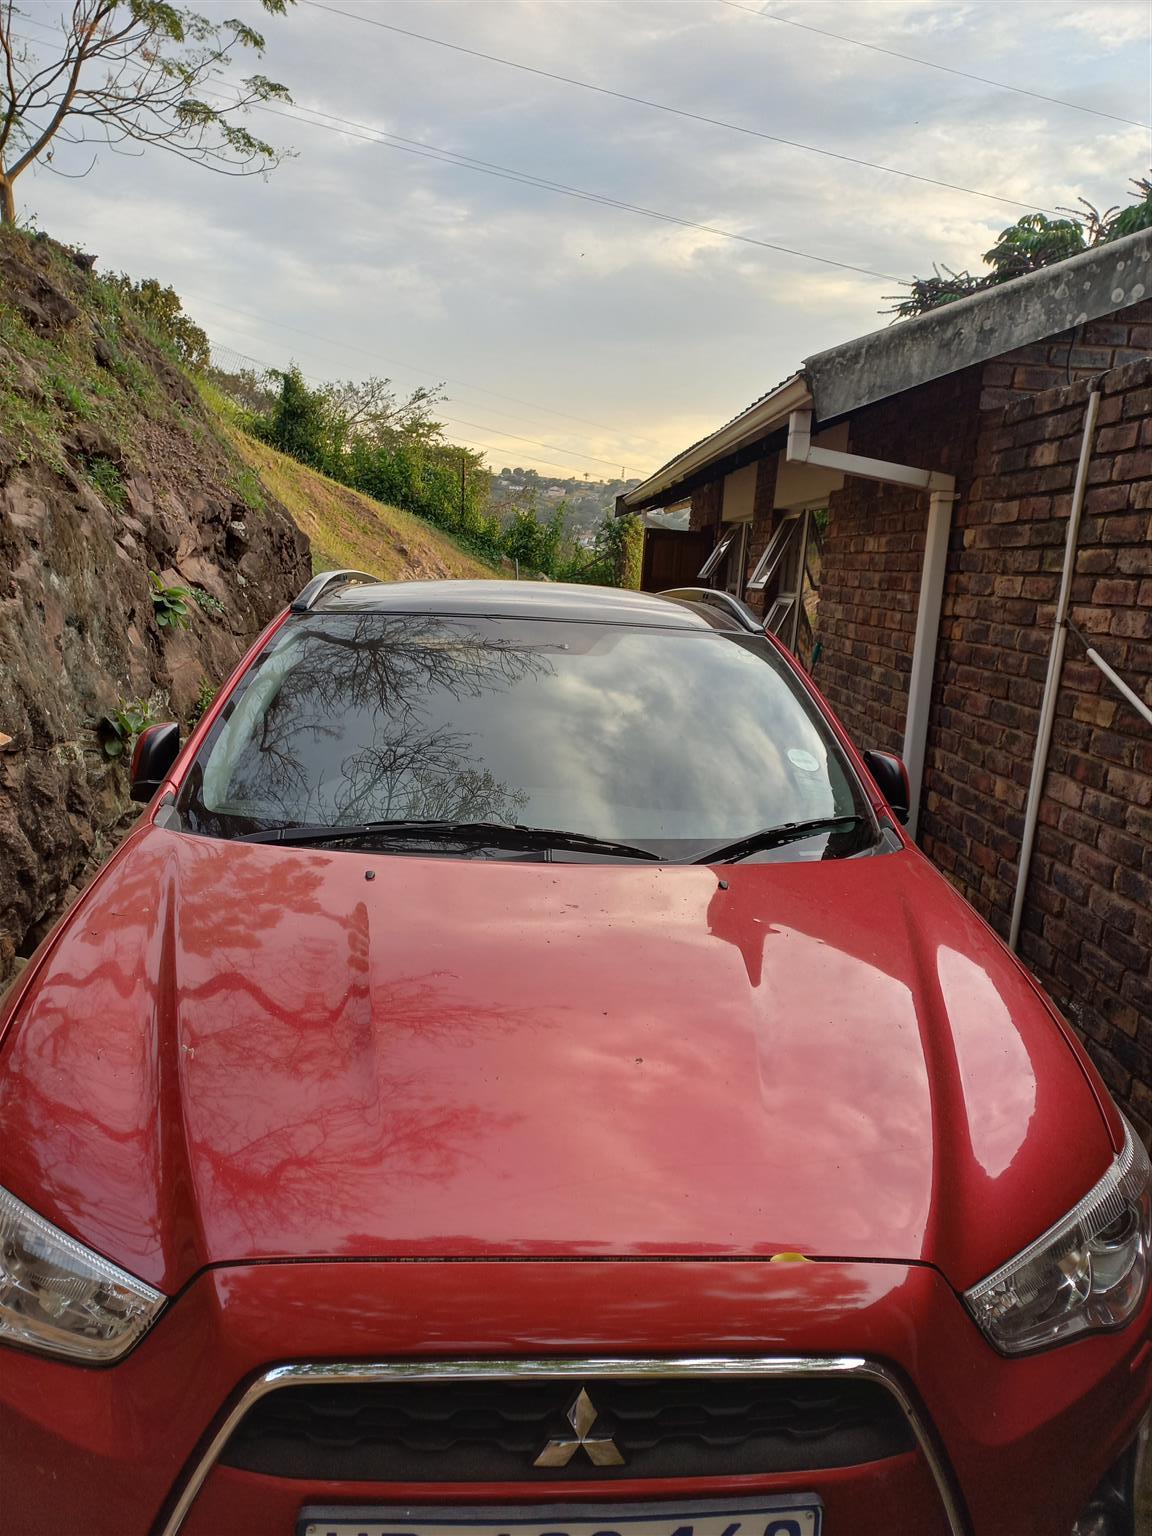 2015 Model Red Mitsubishi Asx 2.0 in Pinetown Durban